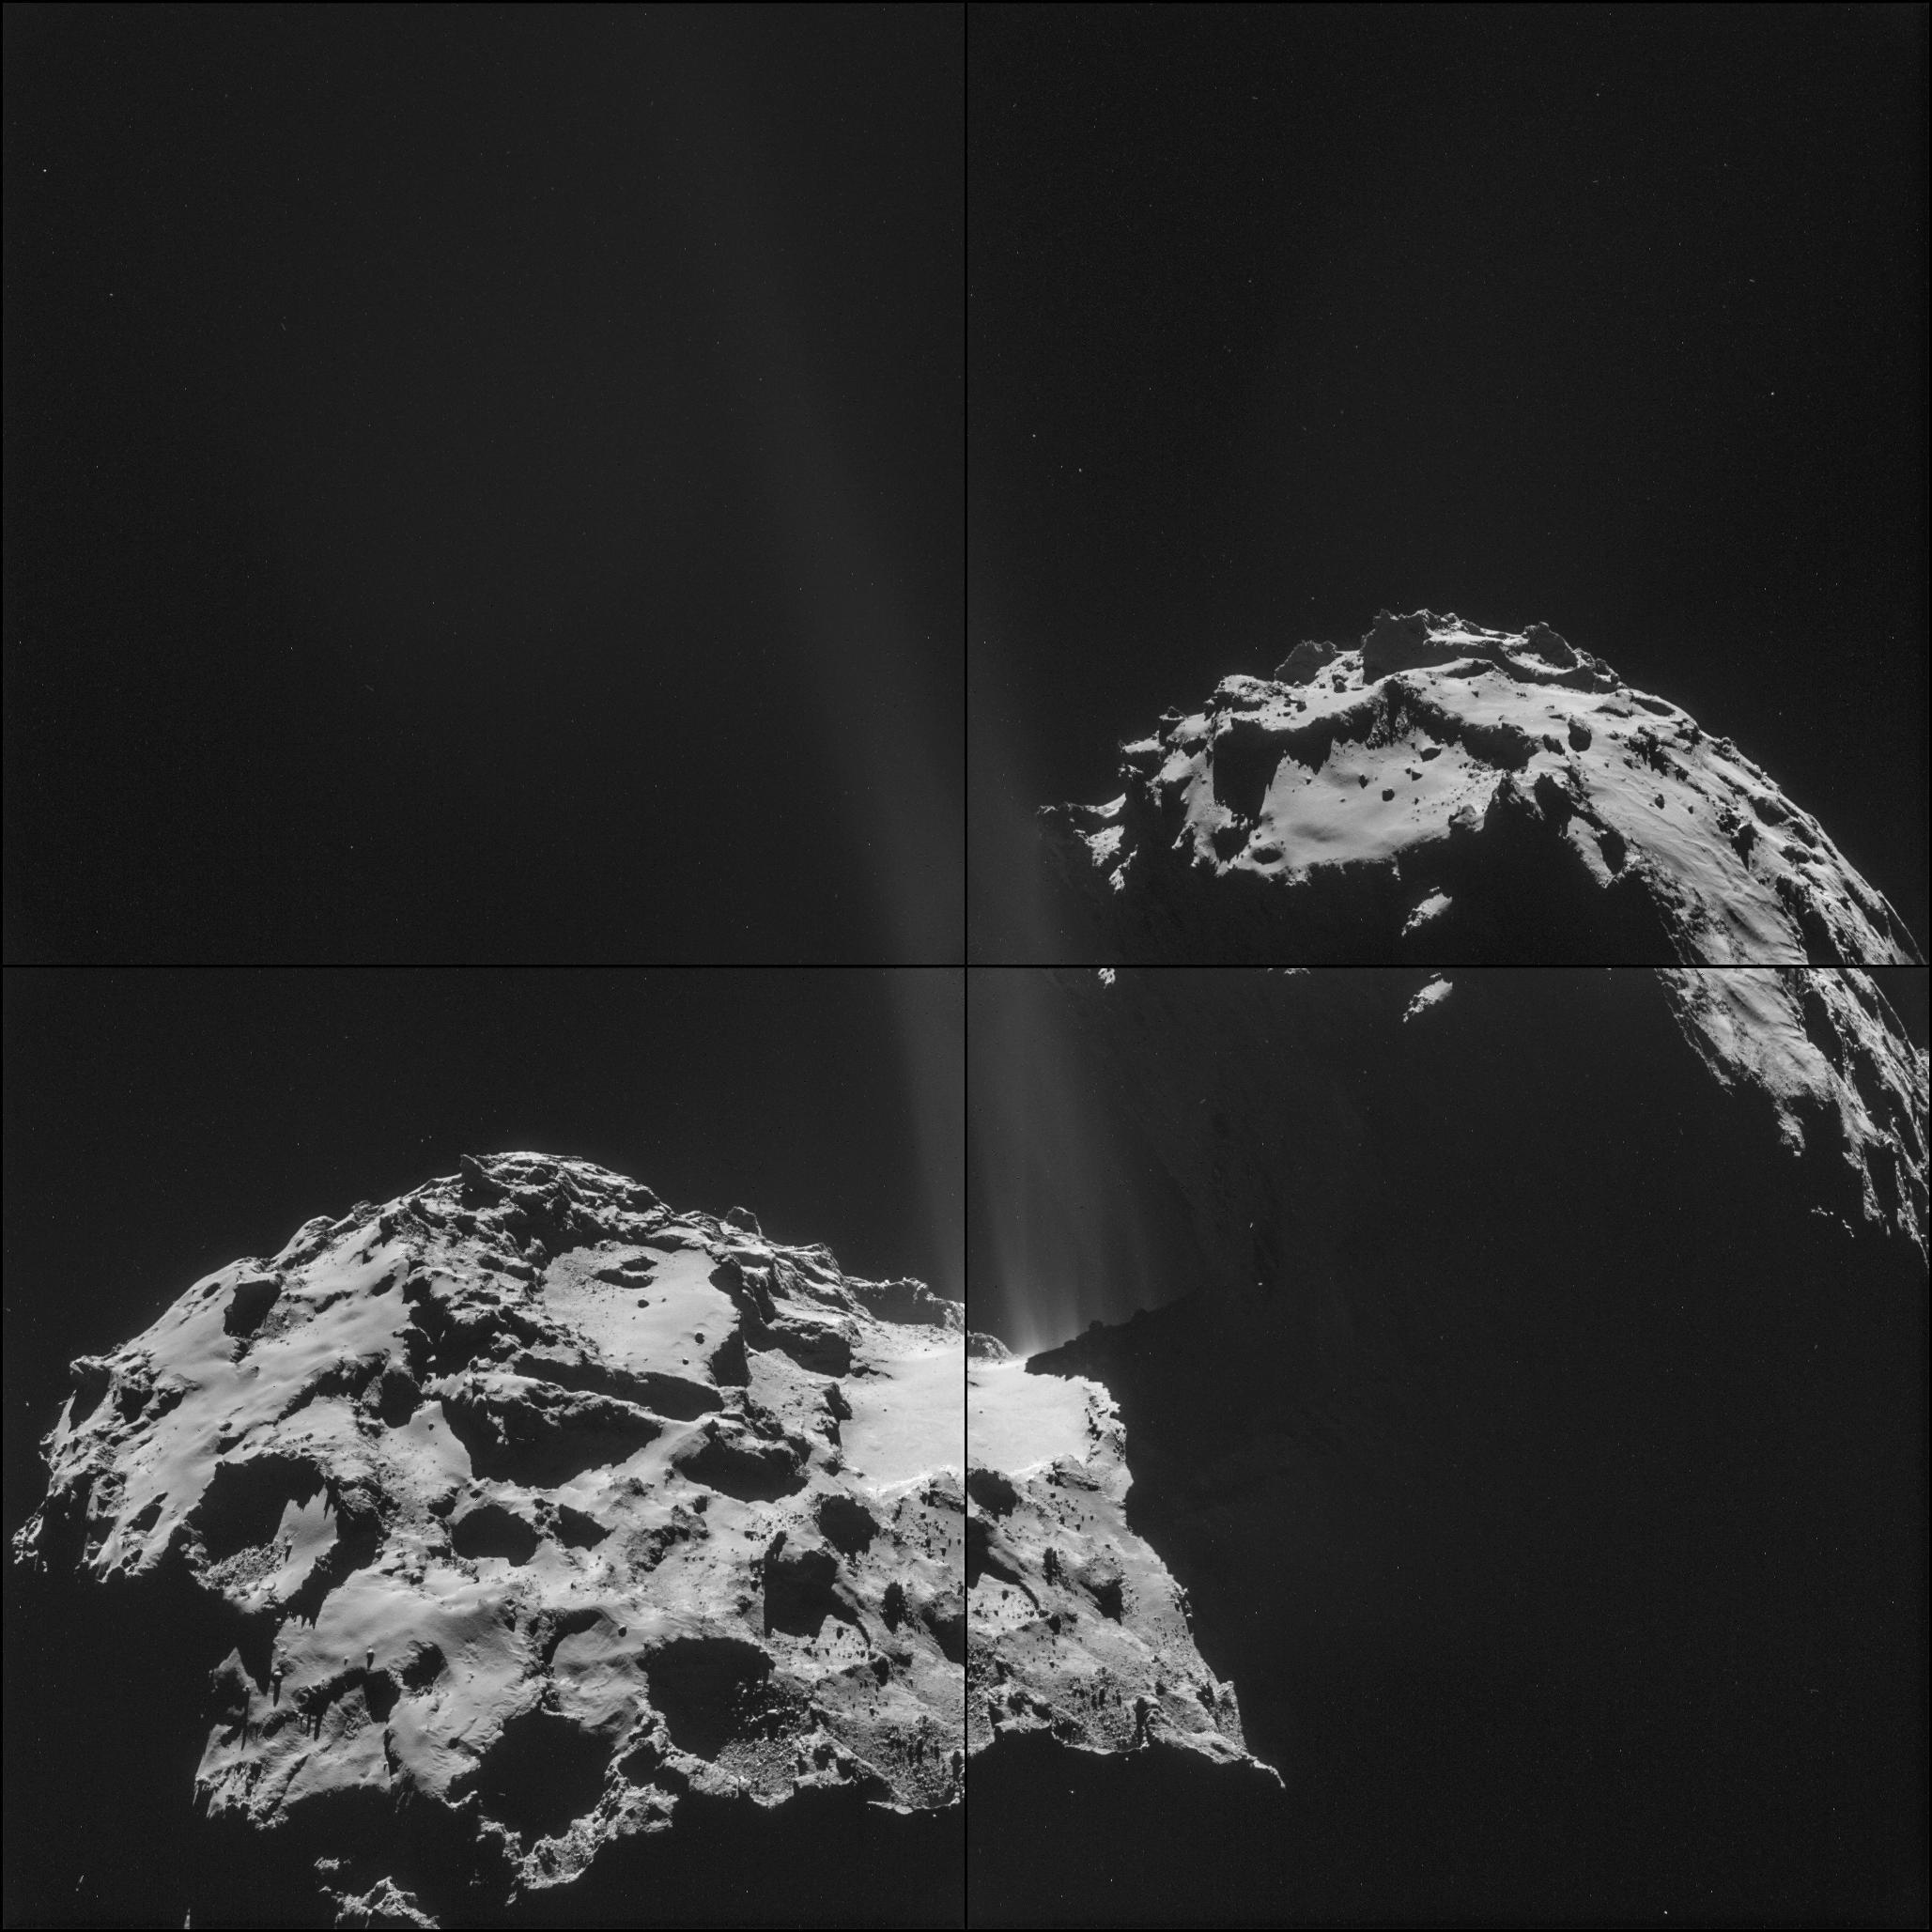 Rosetta Spacecraft's Comet Companion Is Spouting Jets (Photo) Rosetta